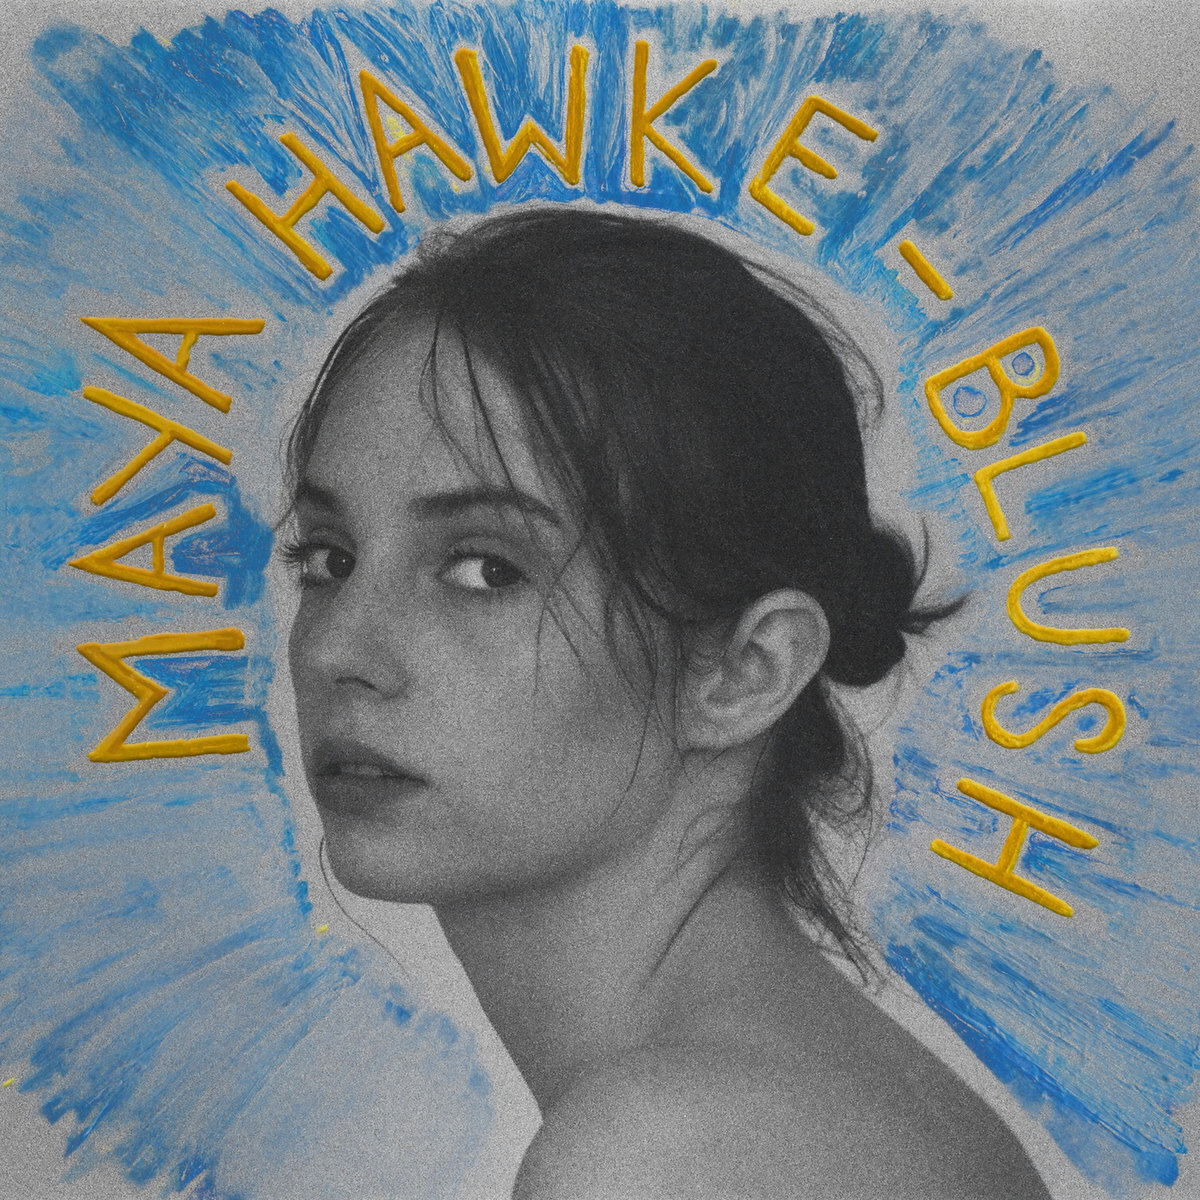 Maya Hawke - Blush (LP)